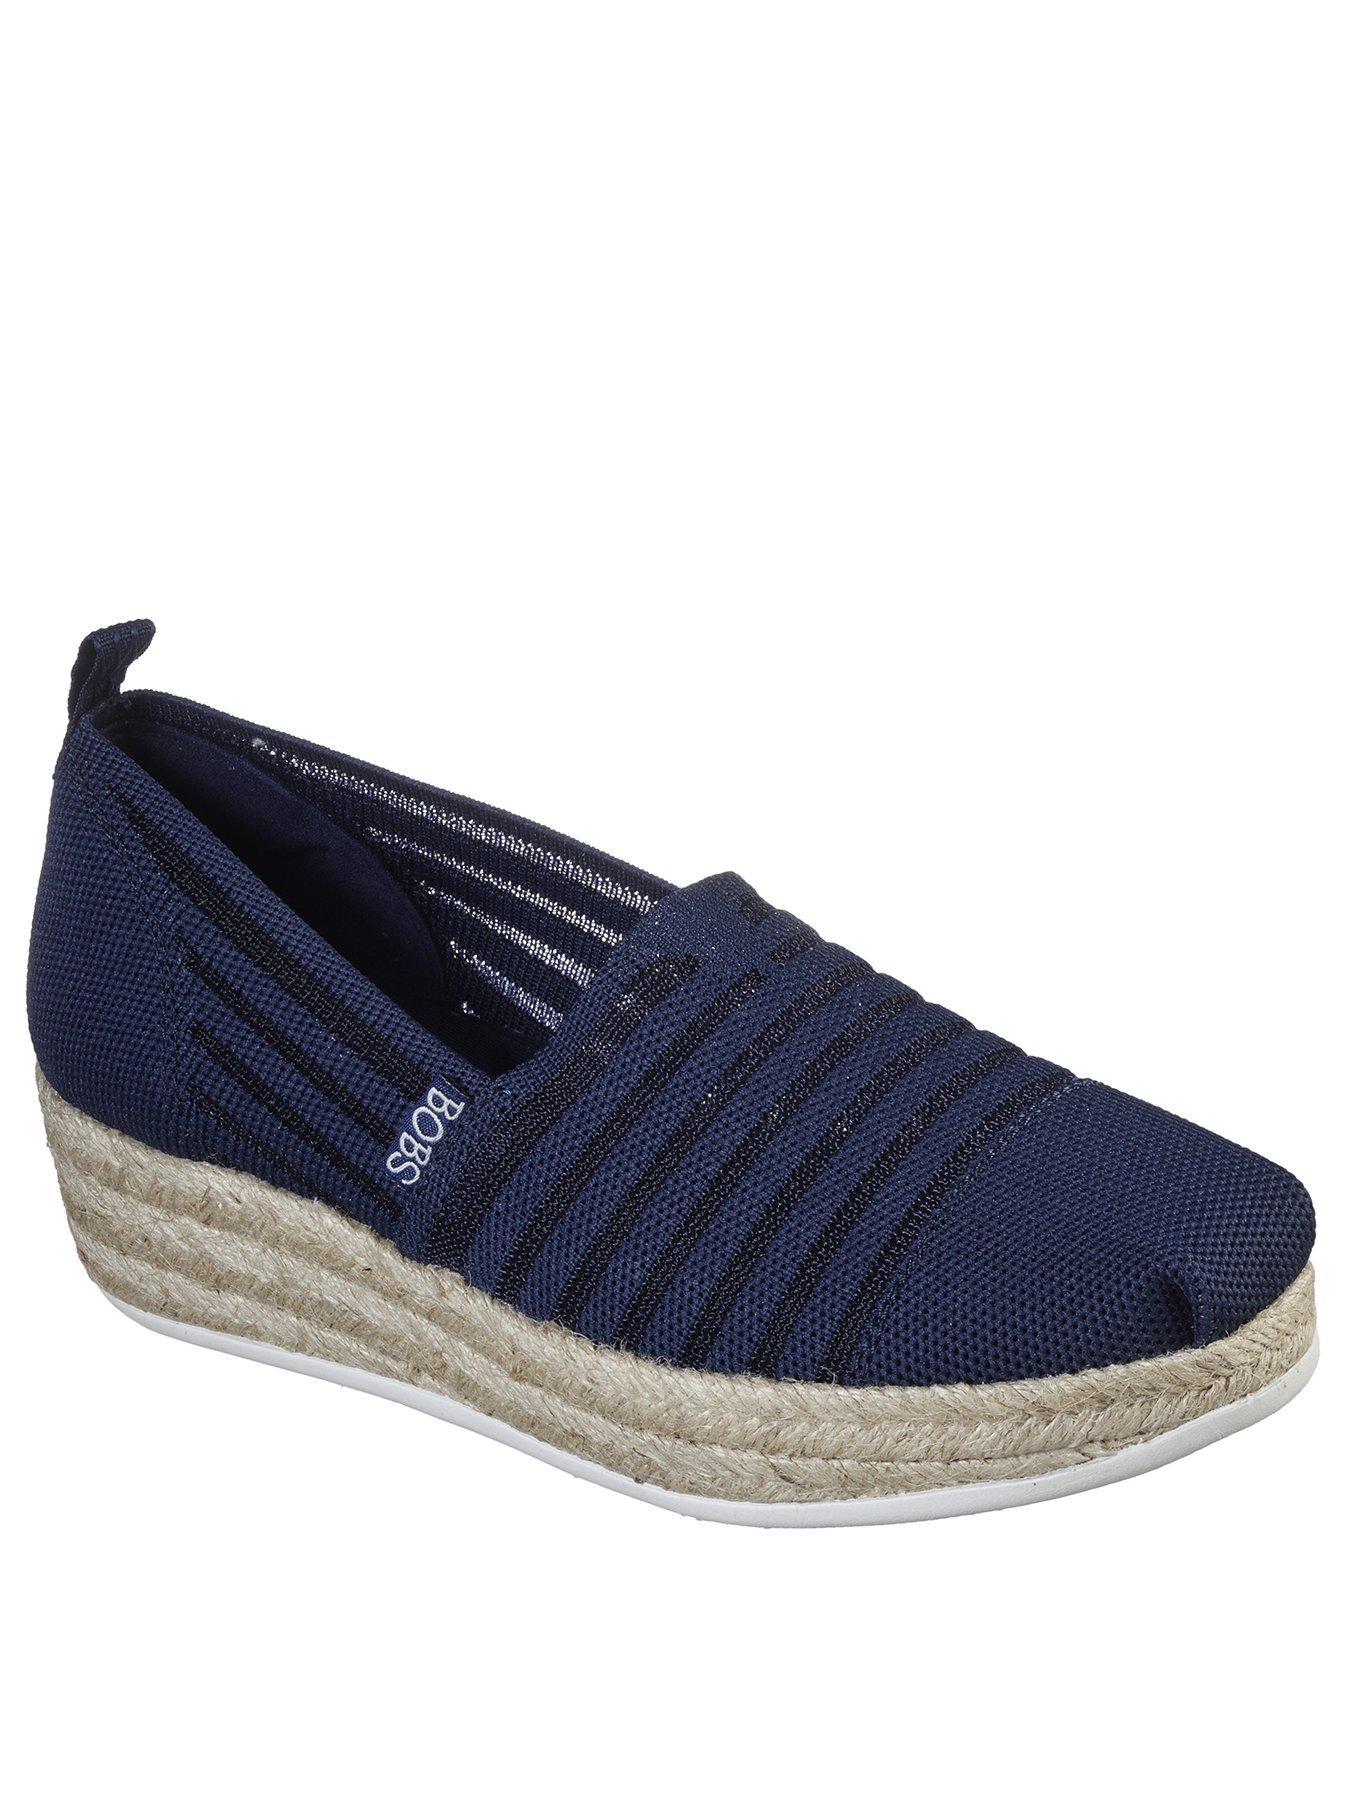 7   Skechers   Shoes \u0026 boots   Women